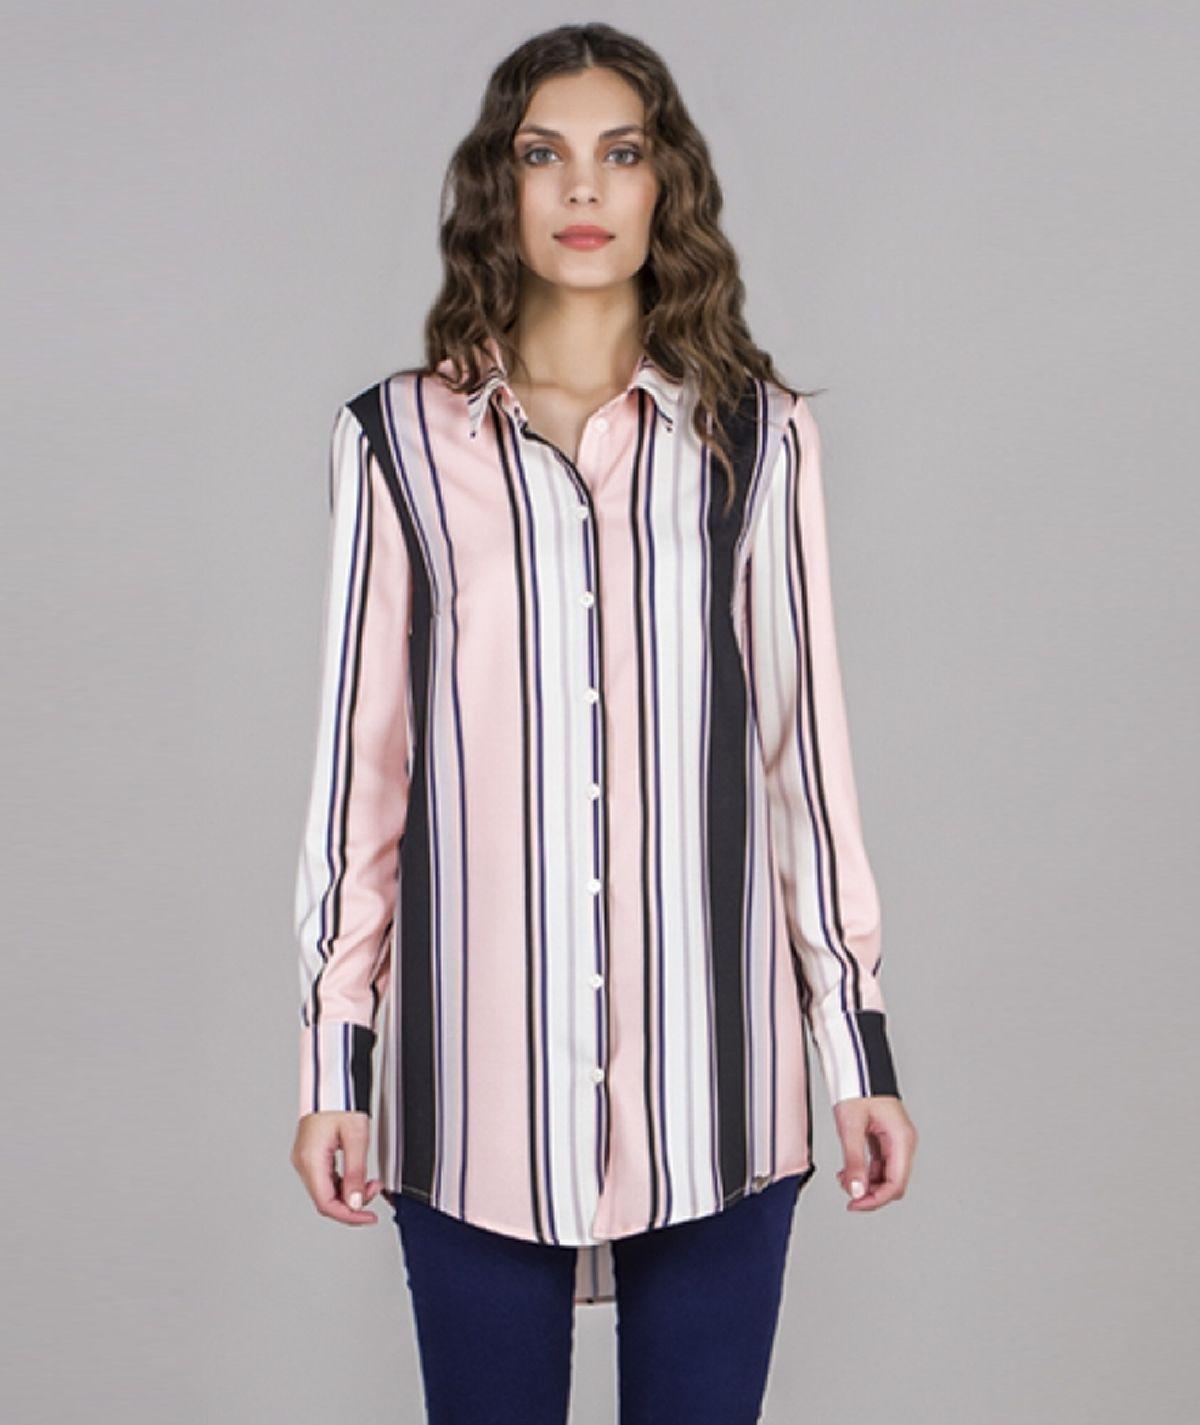 [CHIESSY] Camisa